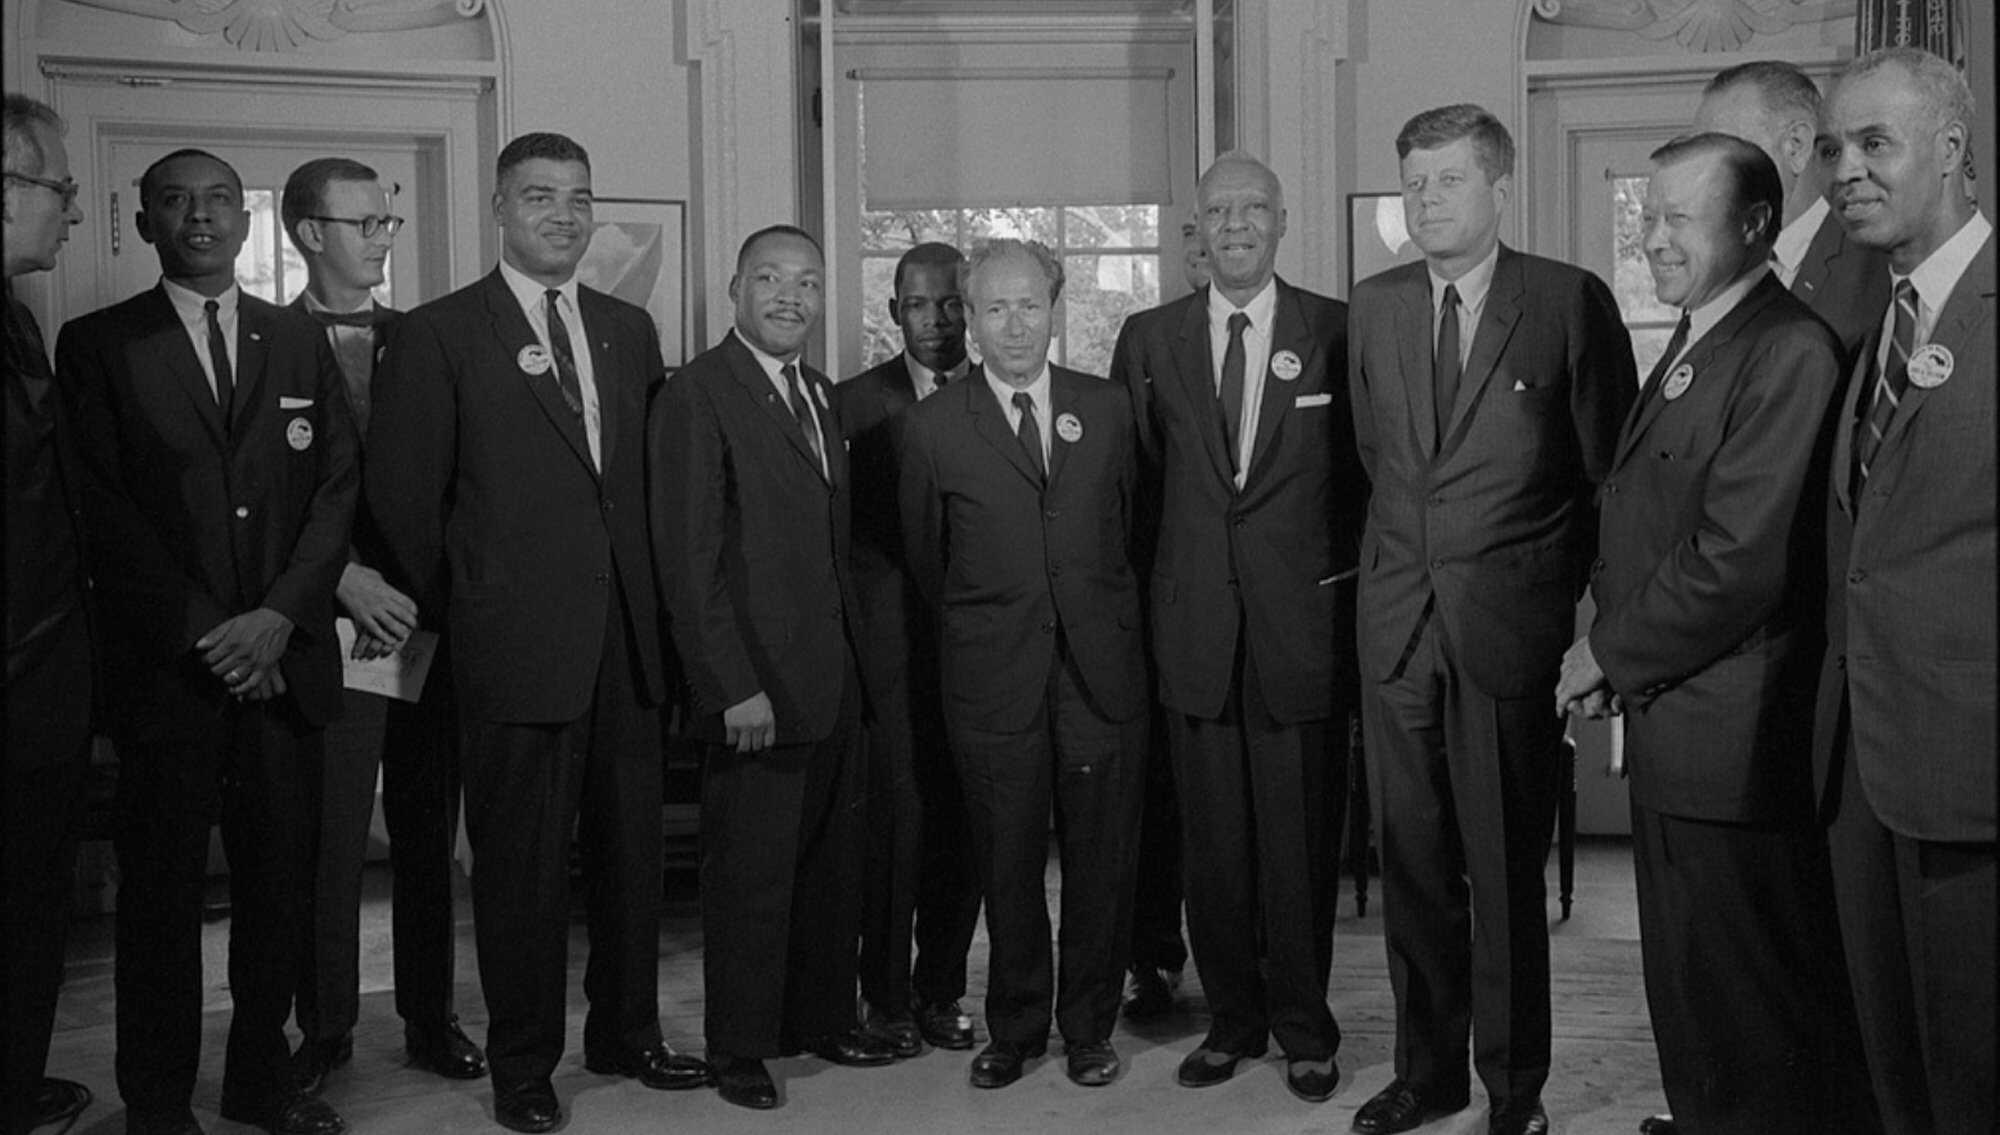 Kennedys-JFK-and-Civil-Rights-1963-LOC.jpg